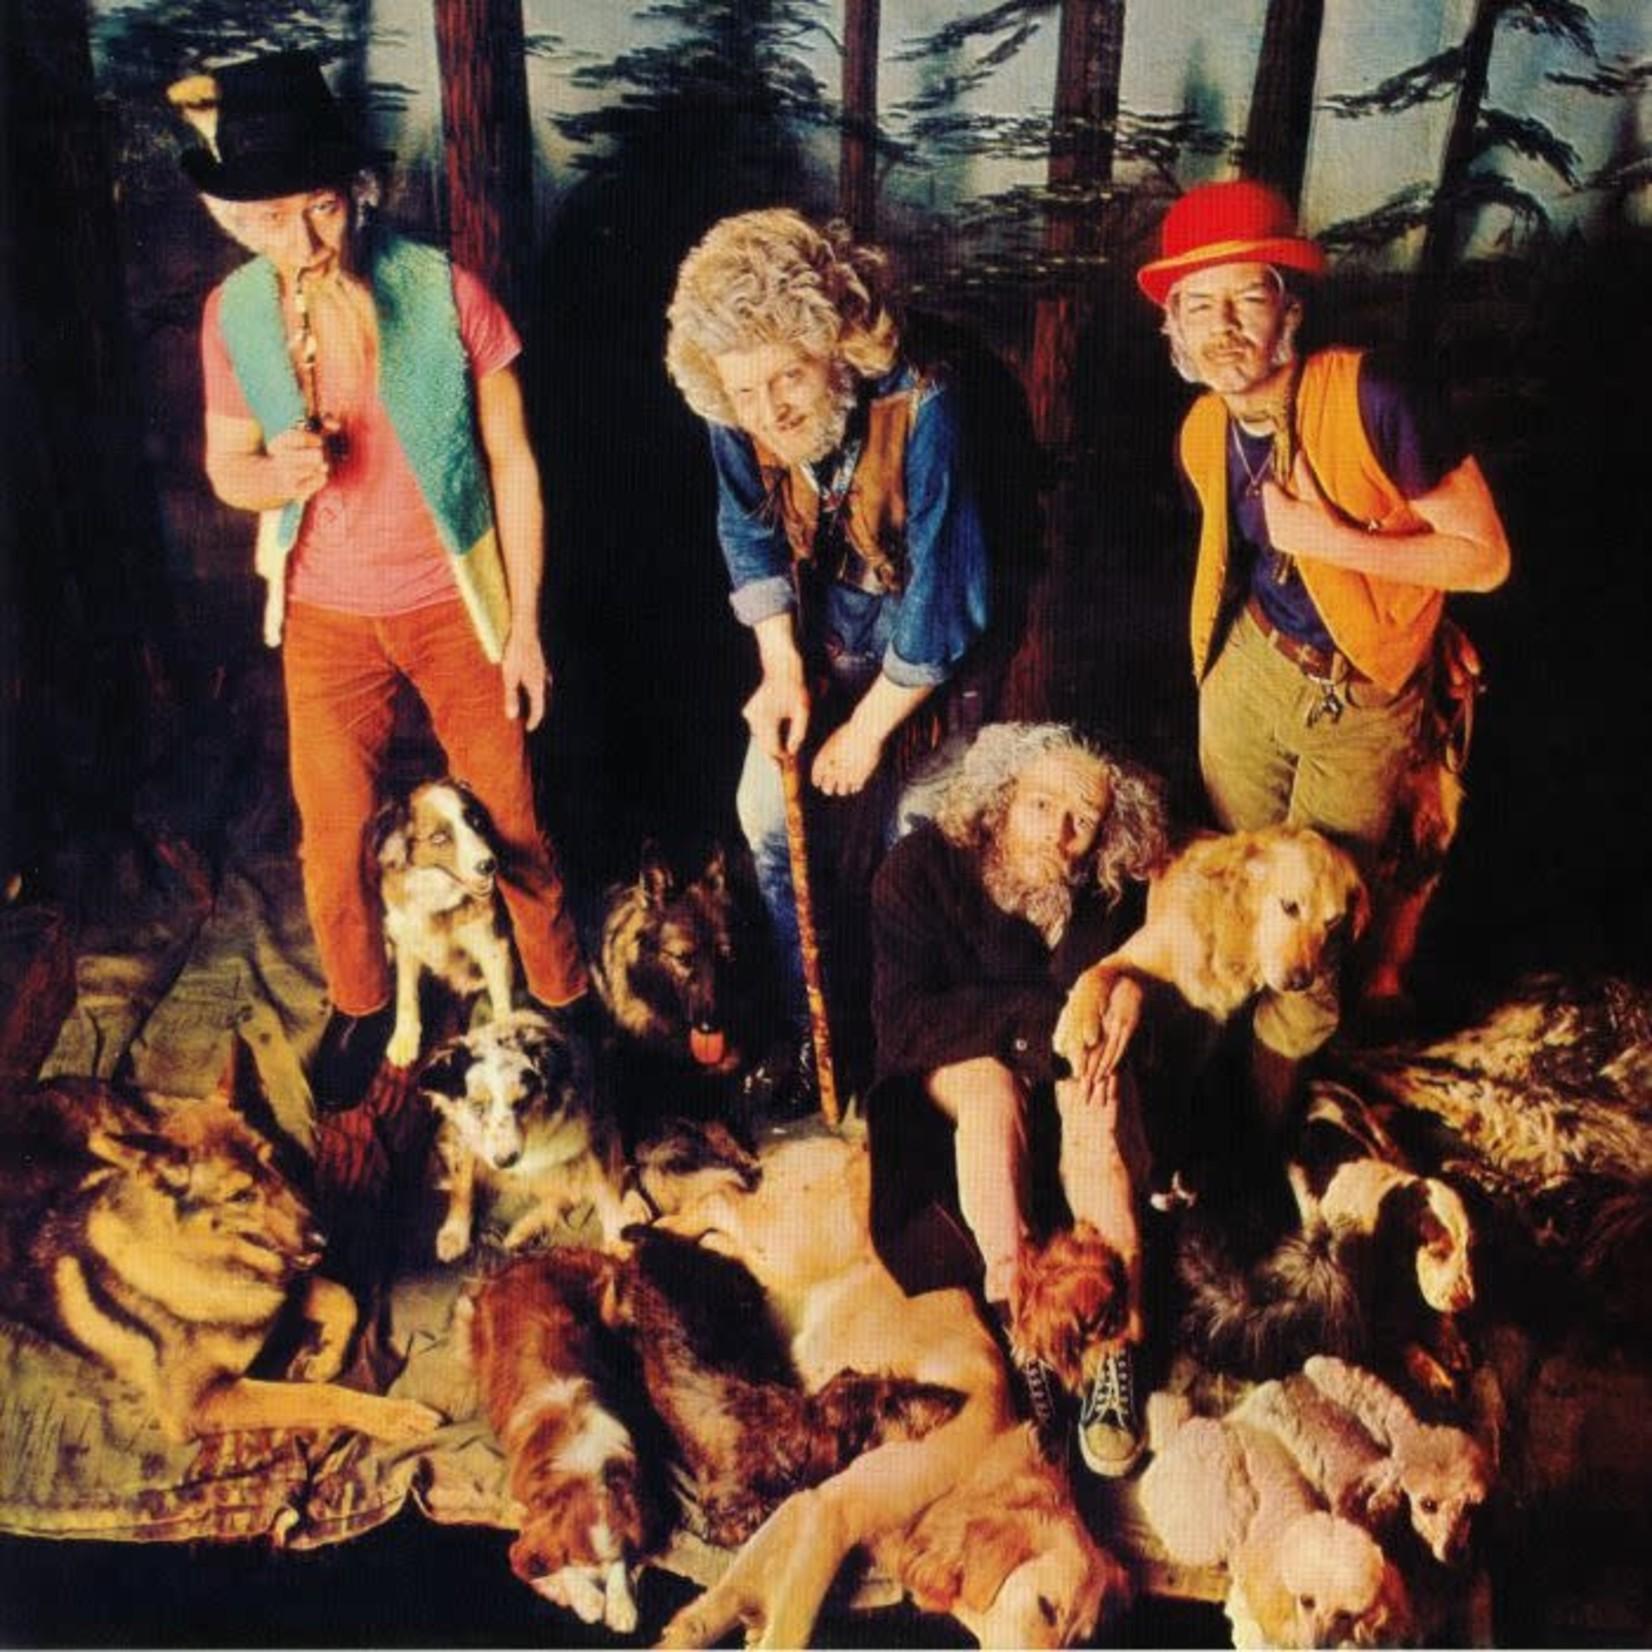 Vinyl Jethro Tull - This Was